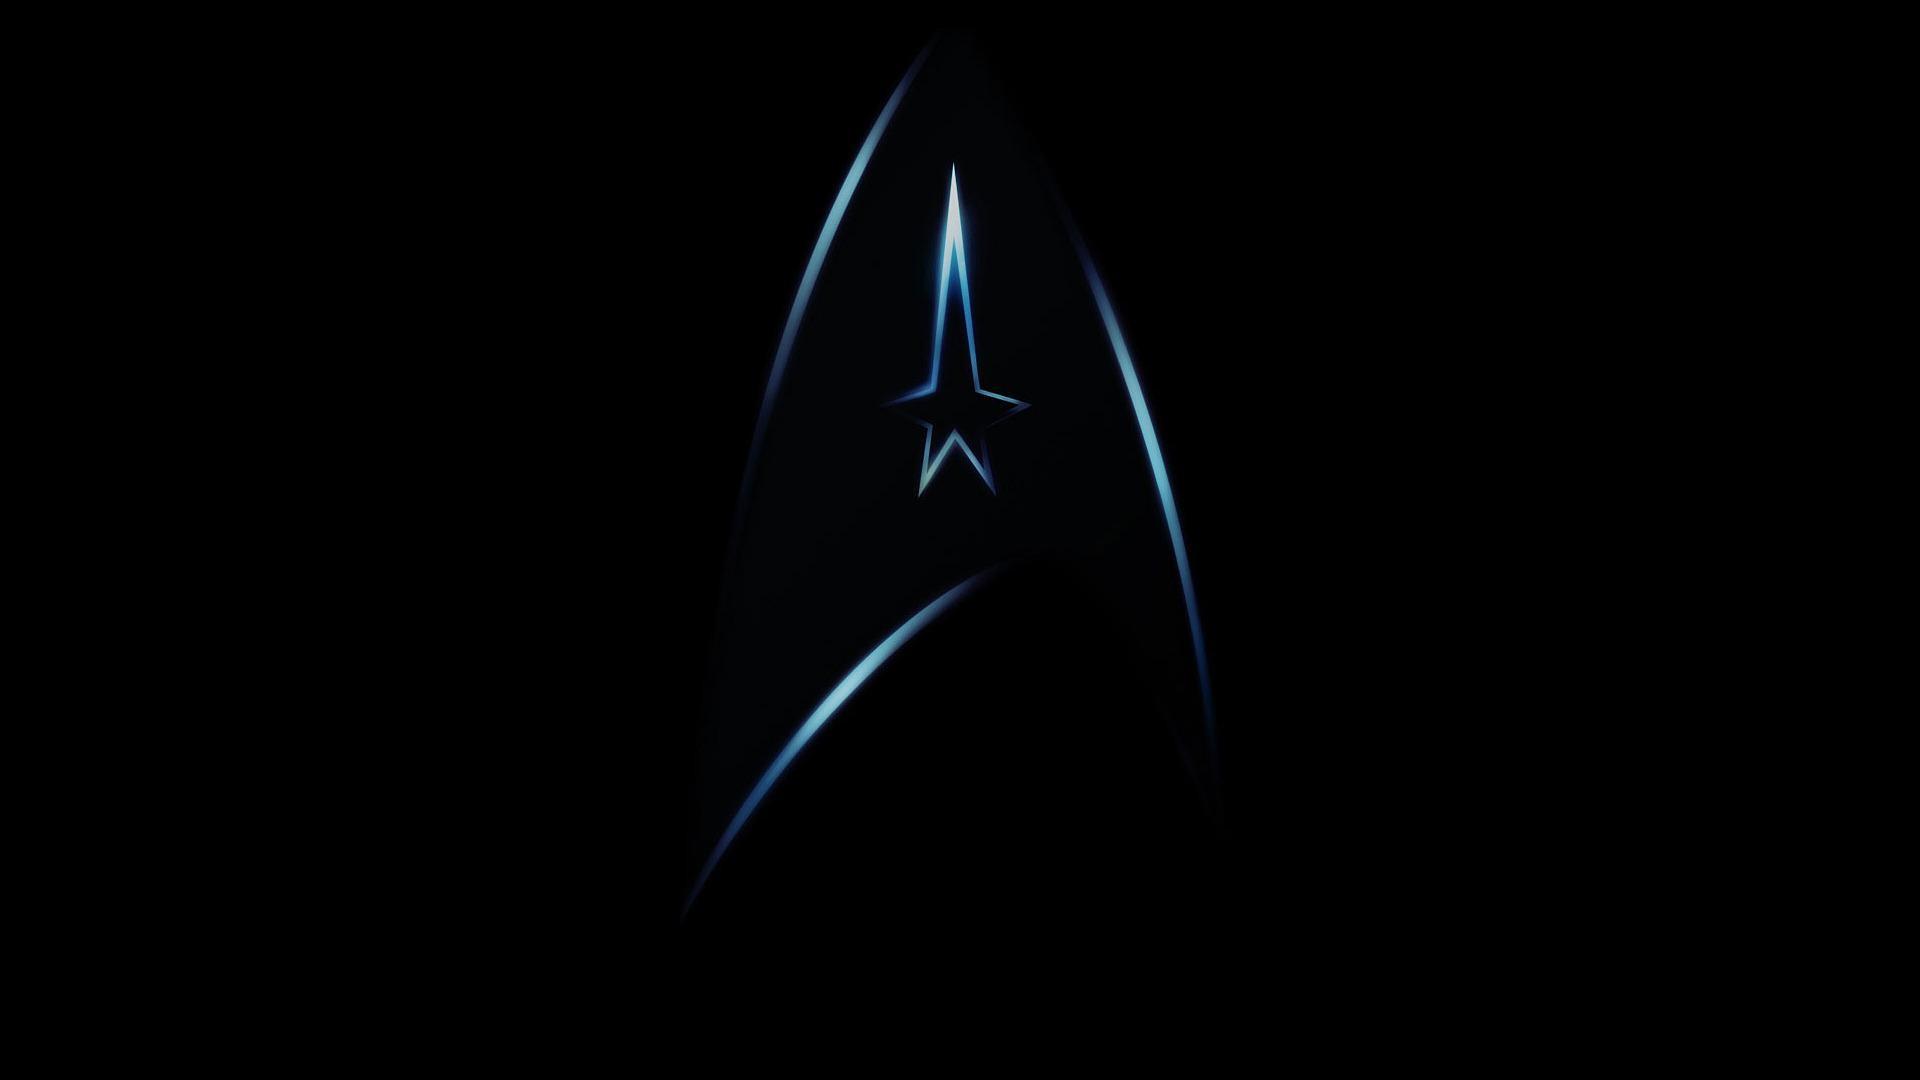 Star Trek Wallpaper Hd Wallpapertag